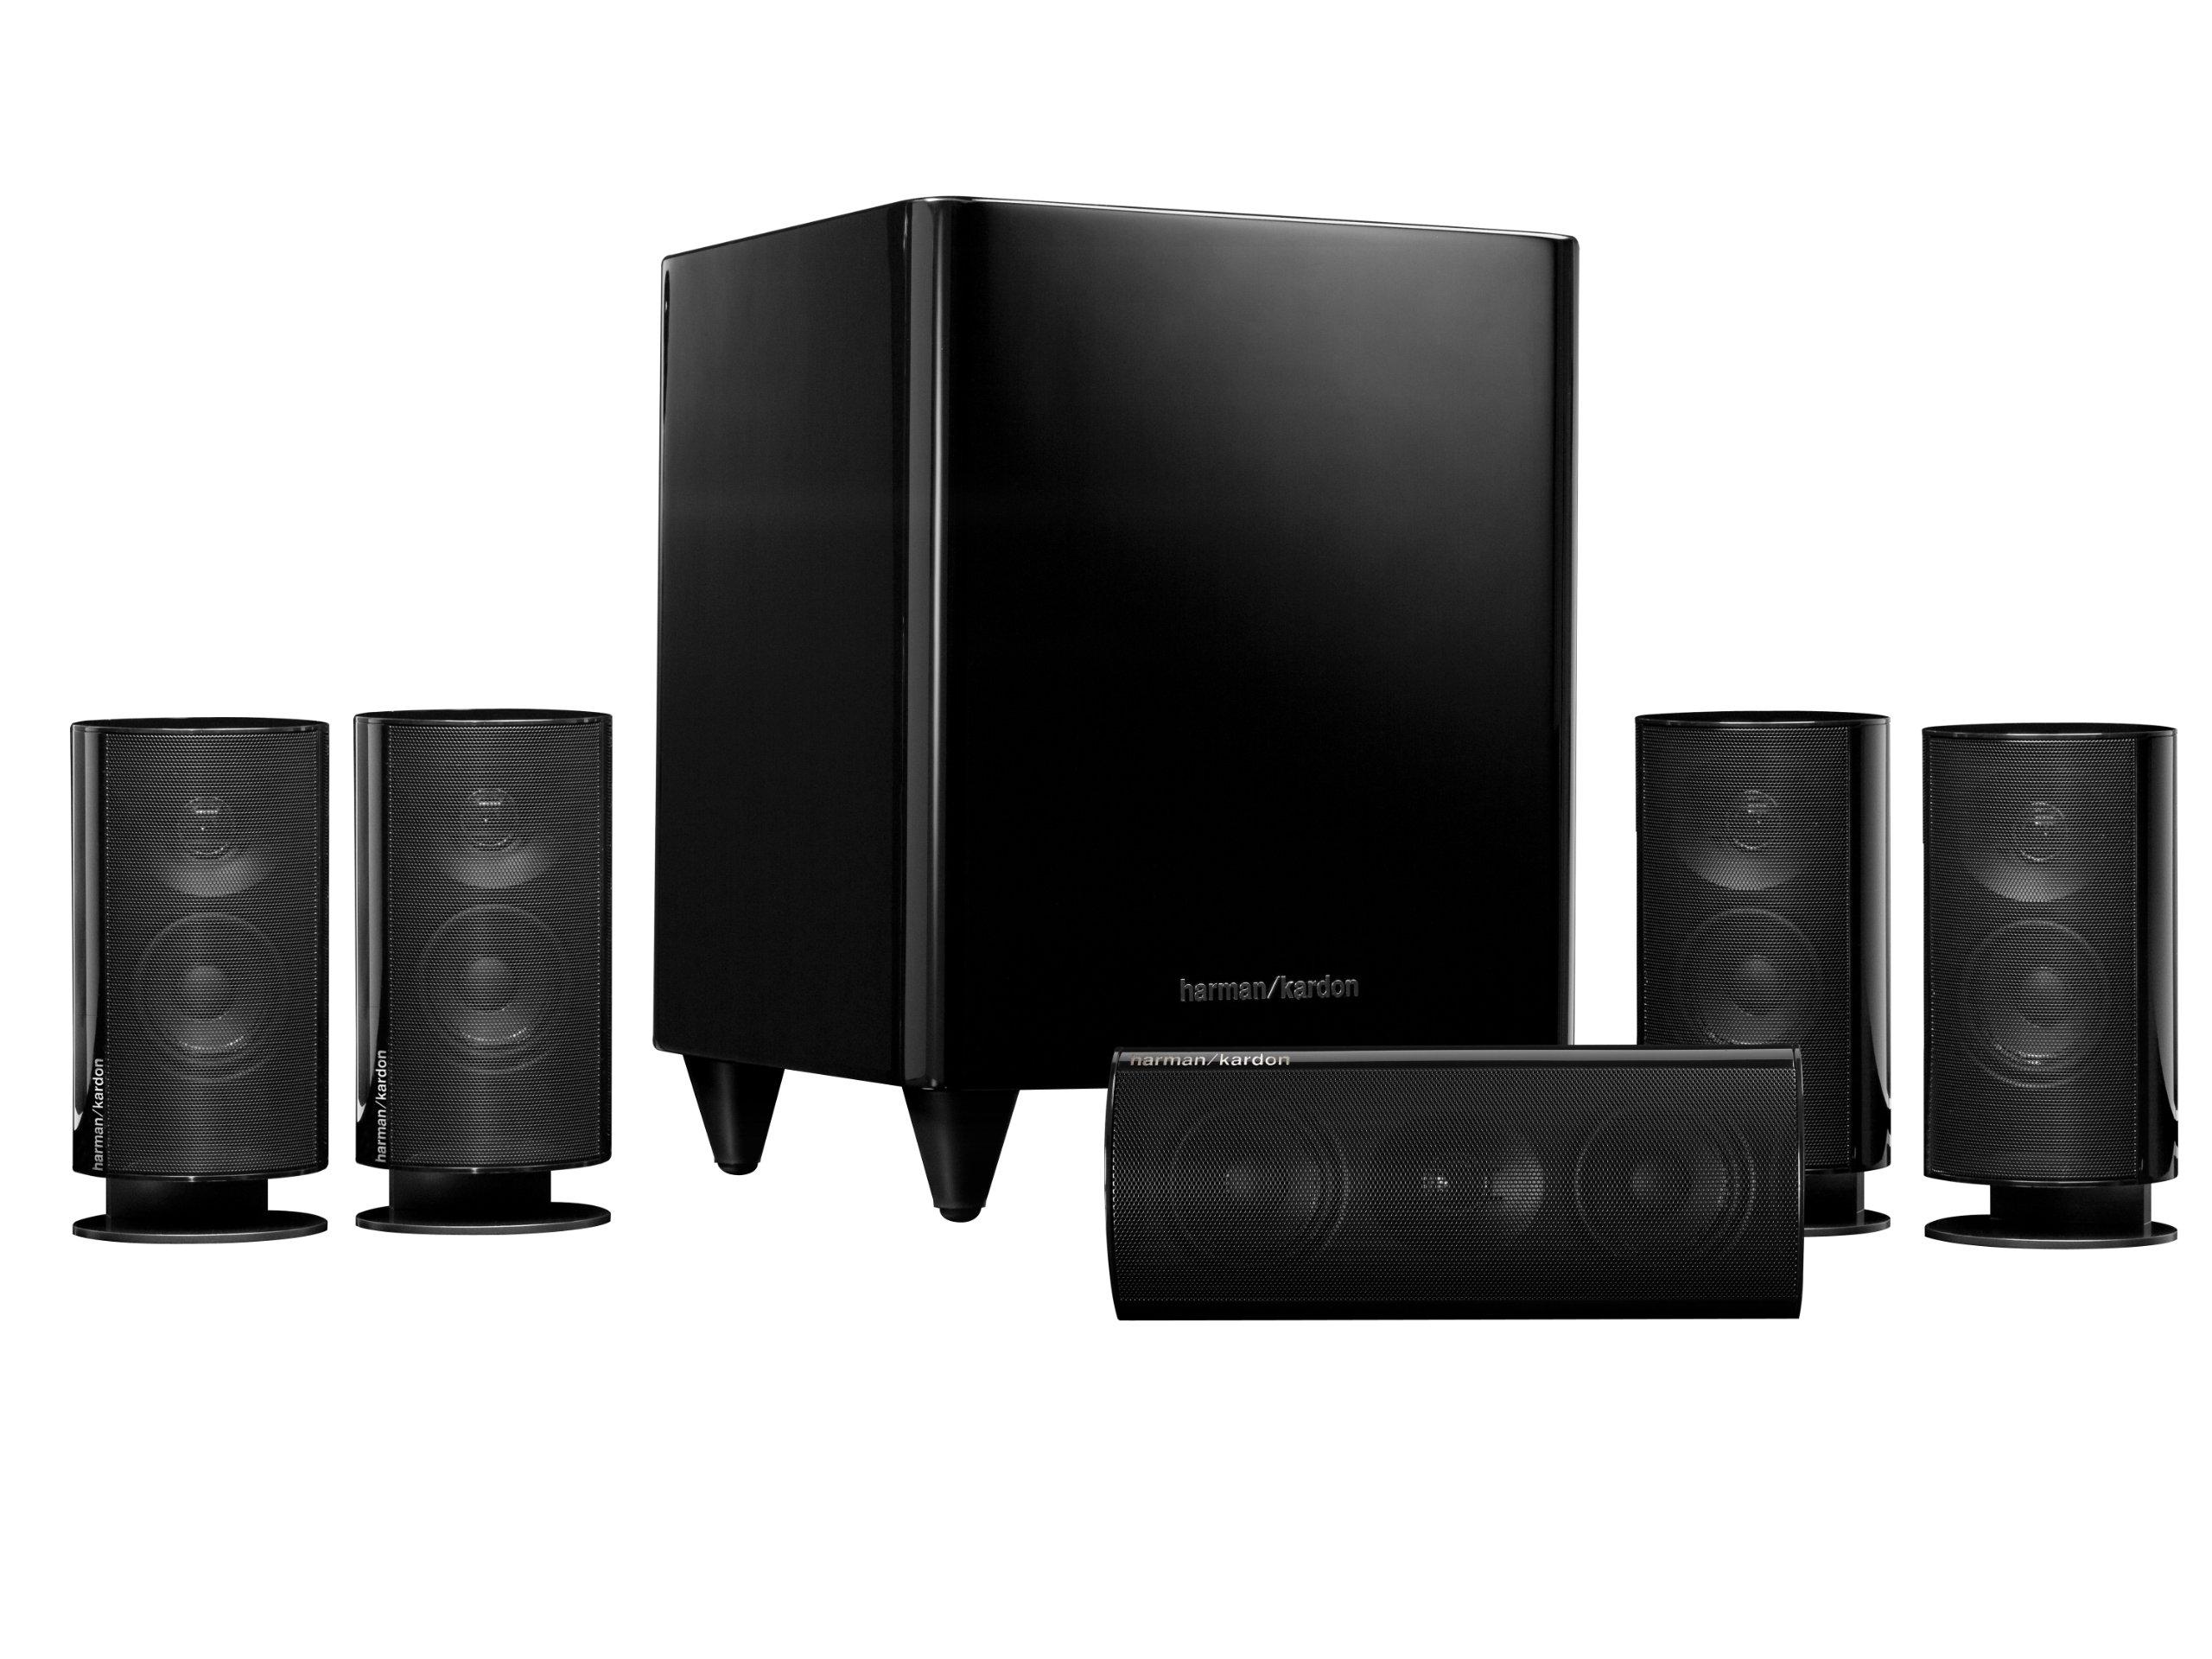 Harman Kardon HKTS 20BQ 5.1 Home Theater Speaker System (Black) by Harman Kardon